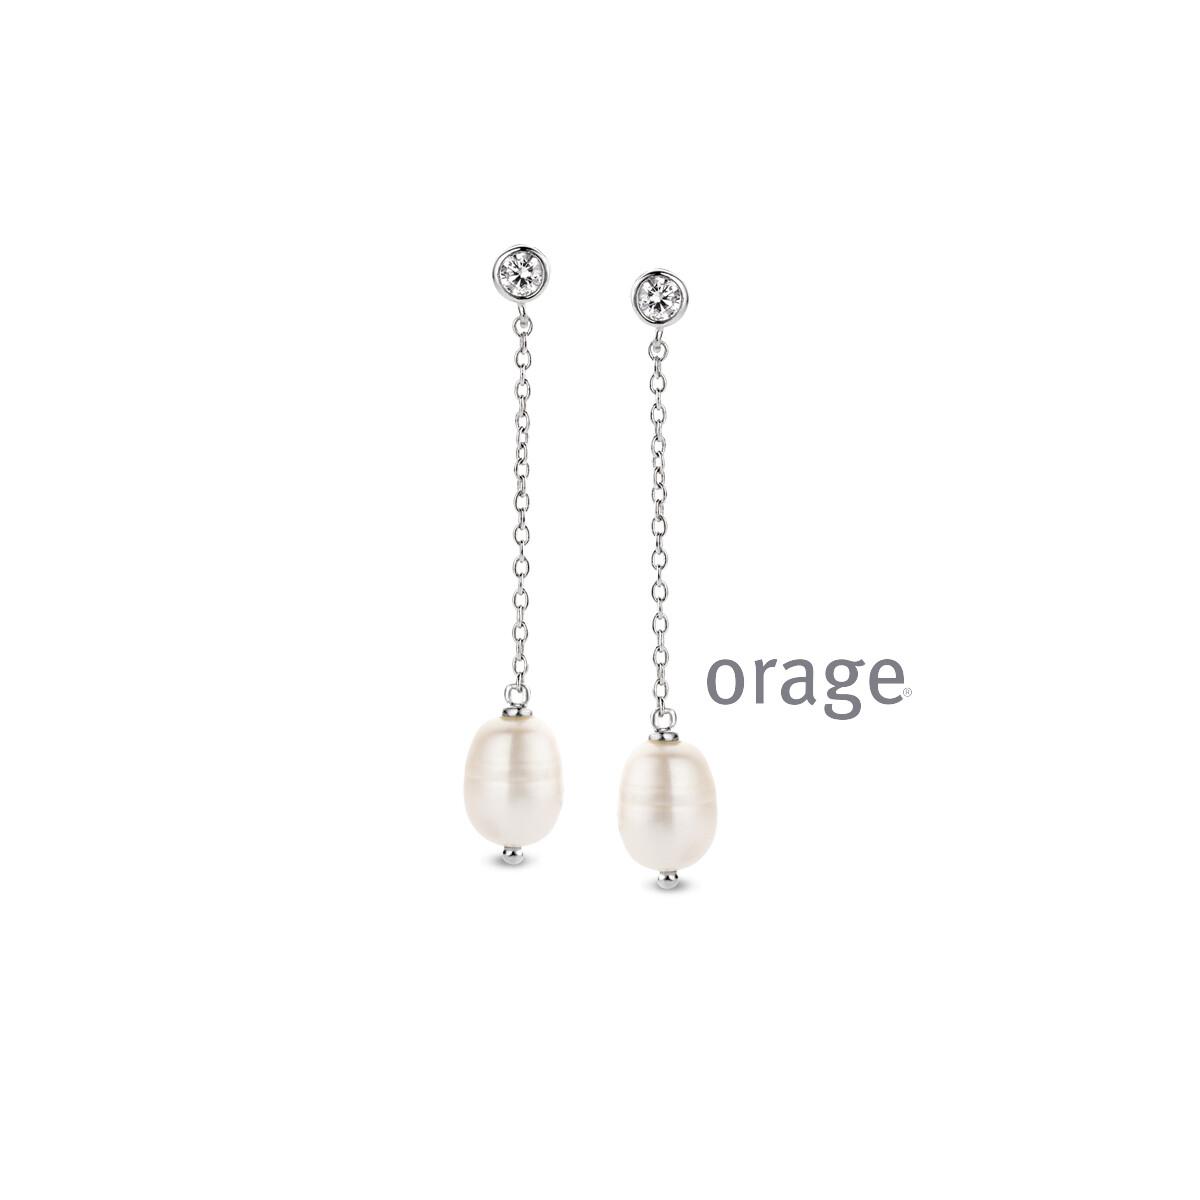 Orage: AR016 Oorslingers parel fwp 925 rh cz (V/14)